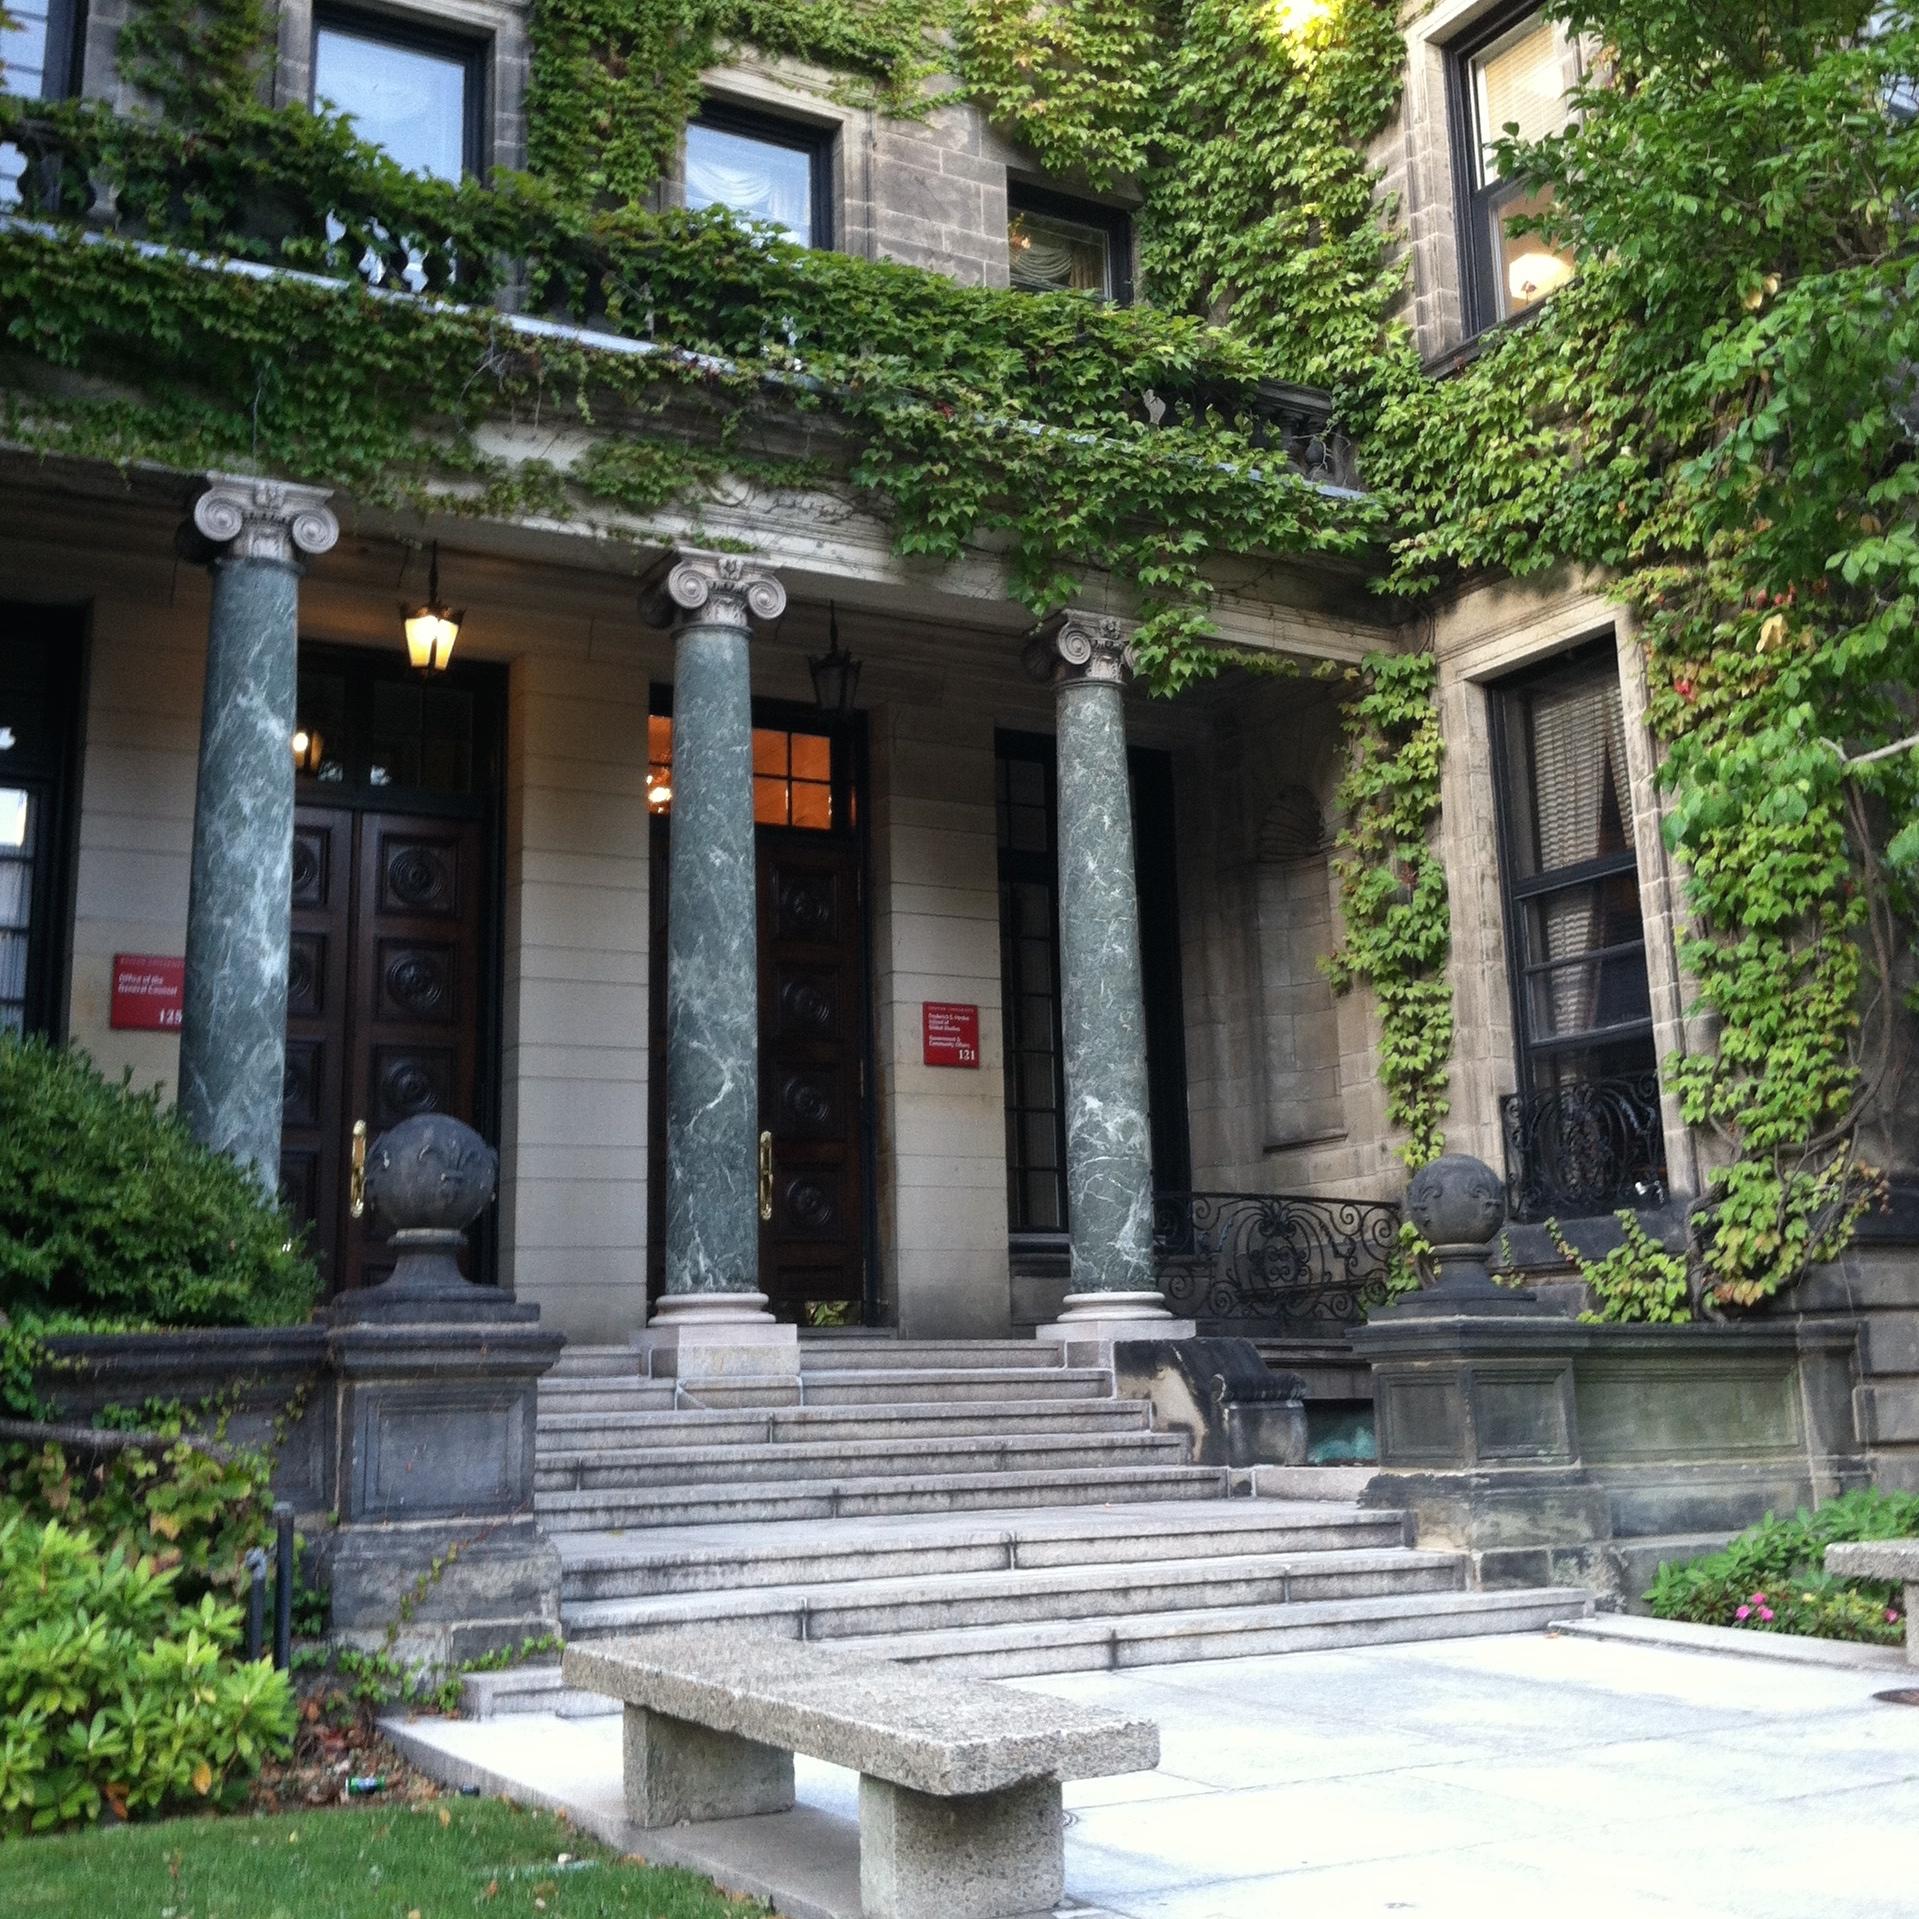 Boston university international relations building